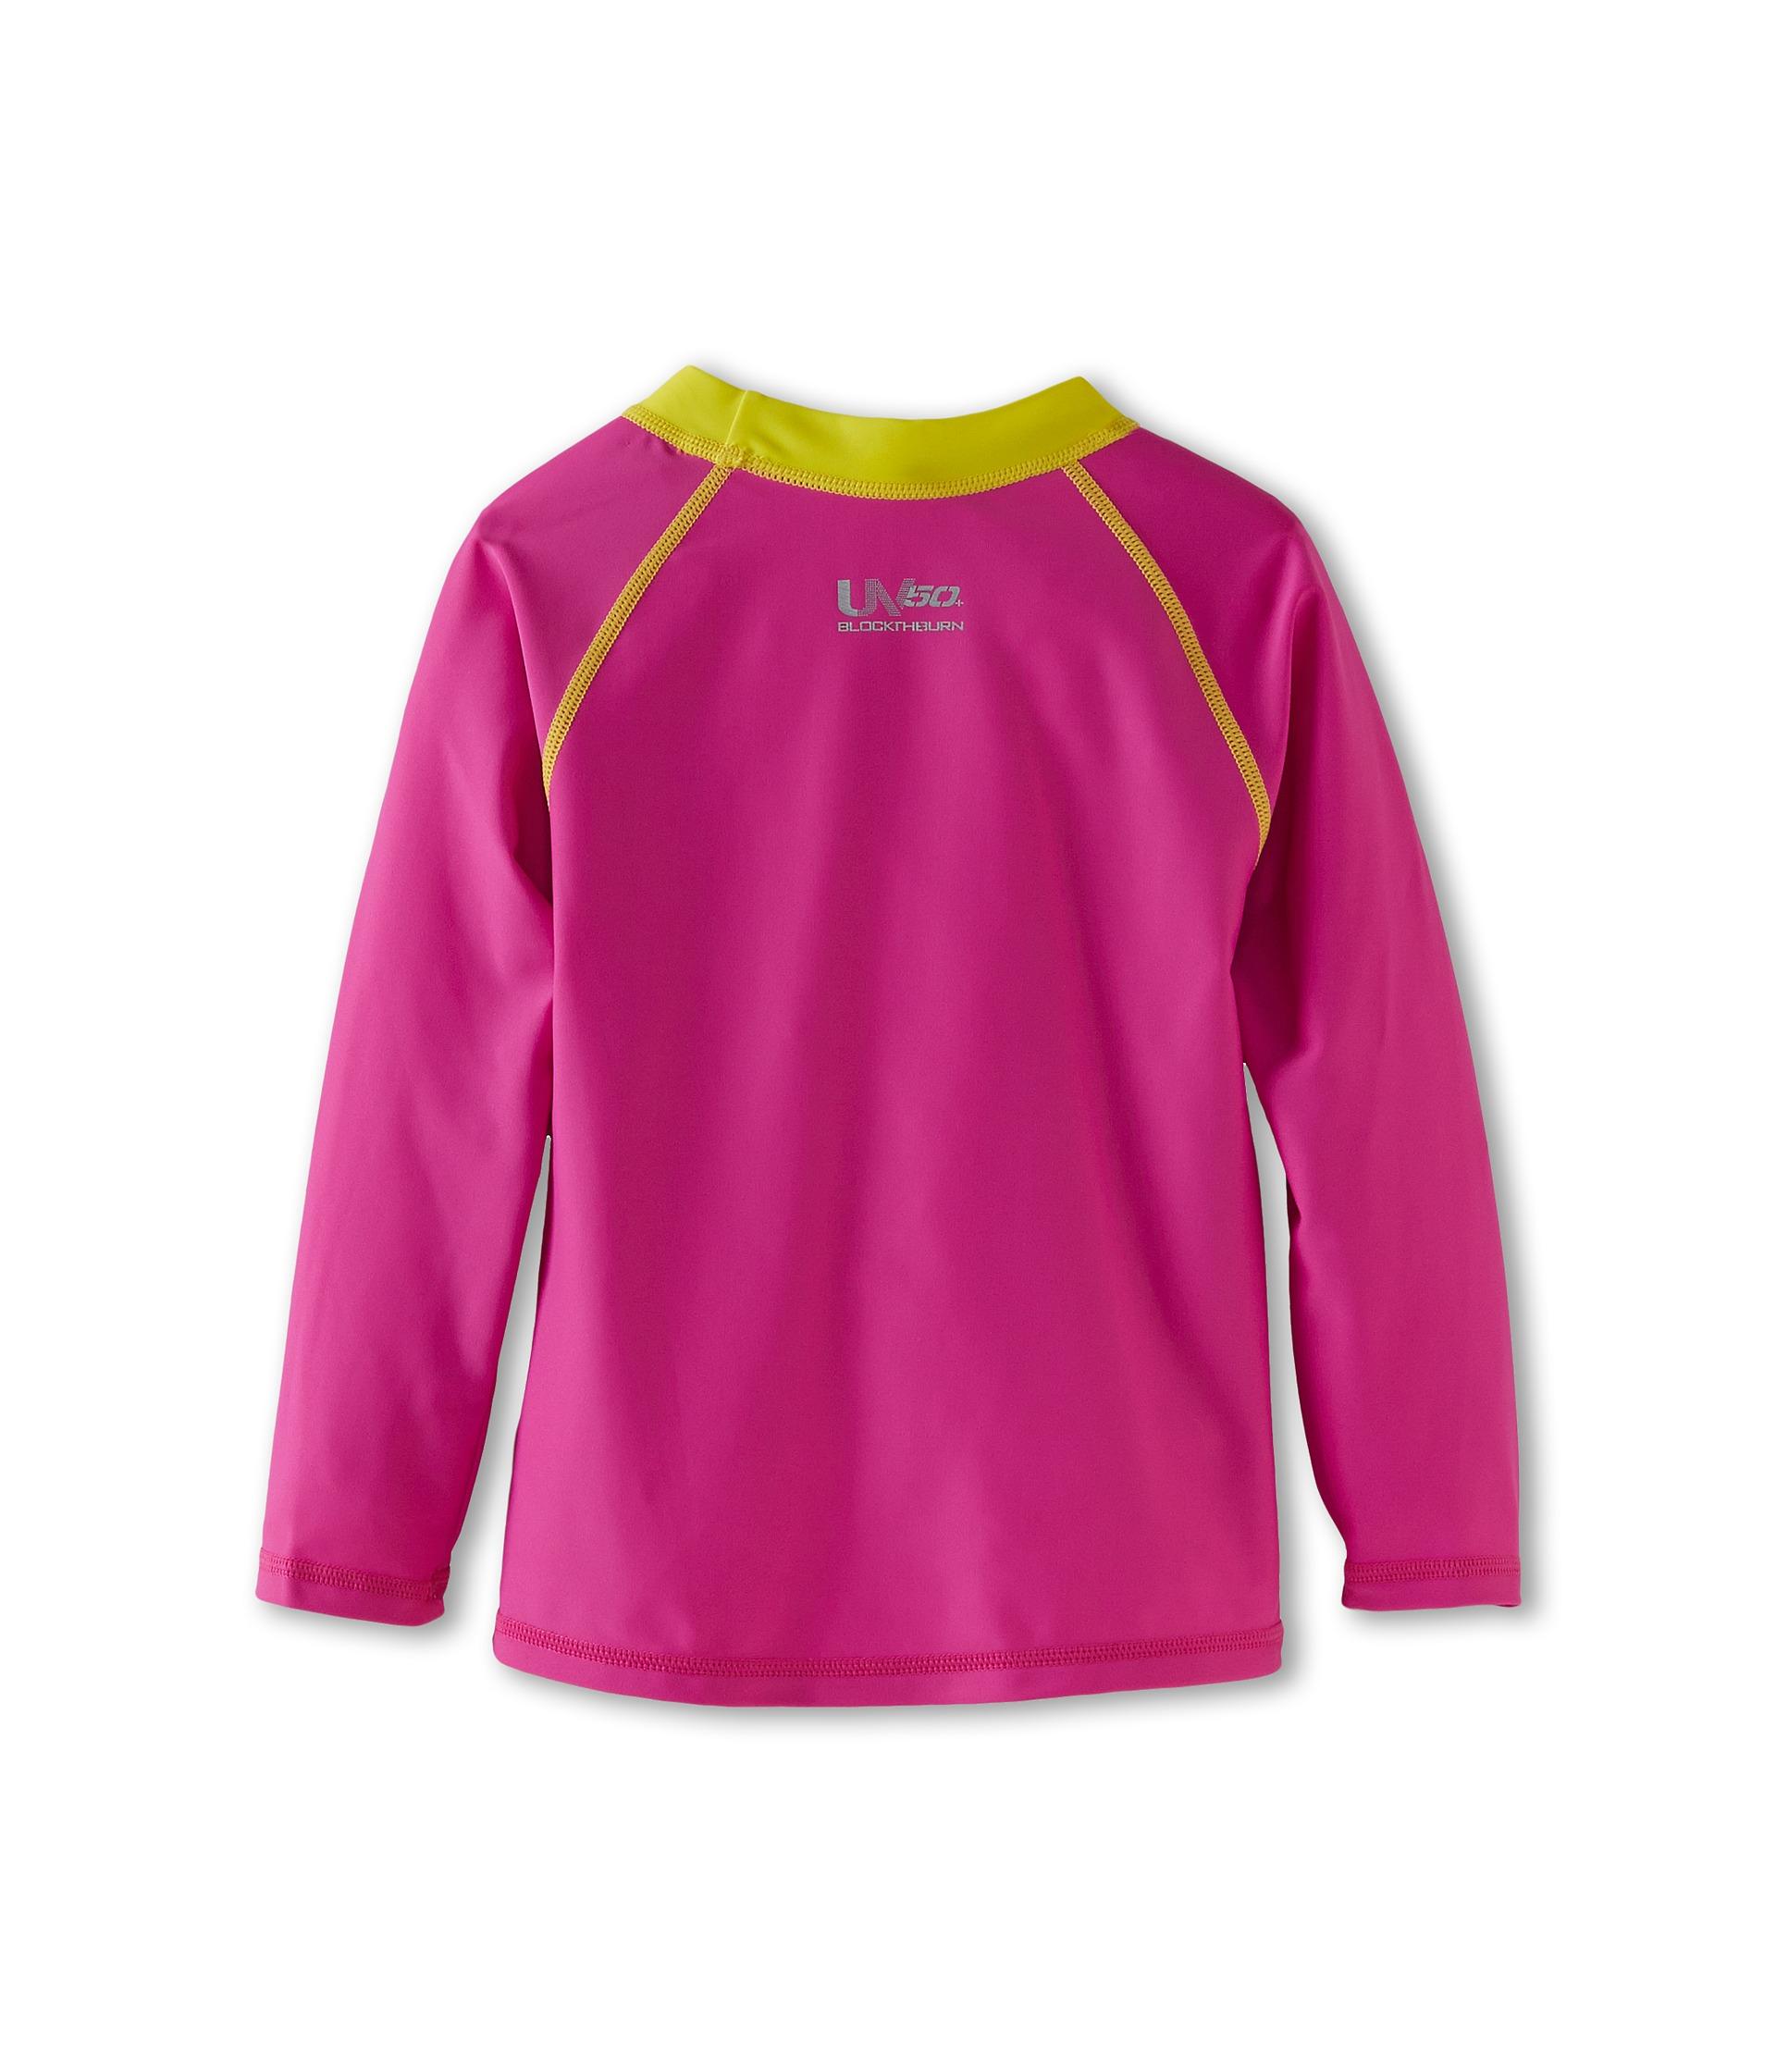 Speedo uv long sleeve sun shirt toddler little kids pink for Uv shirts long sleeve